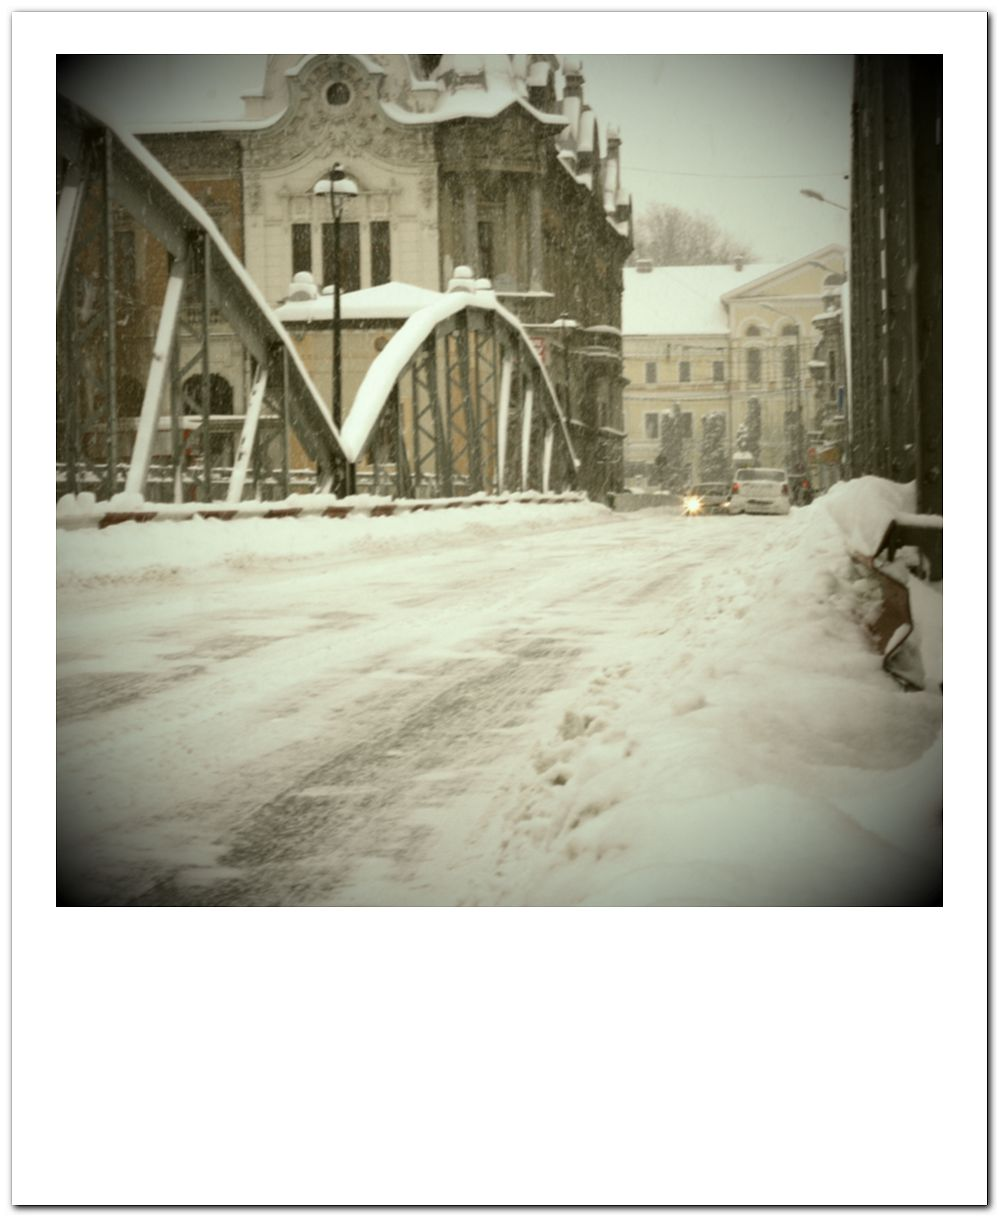 podul de fier sub zapada